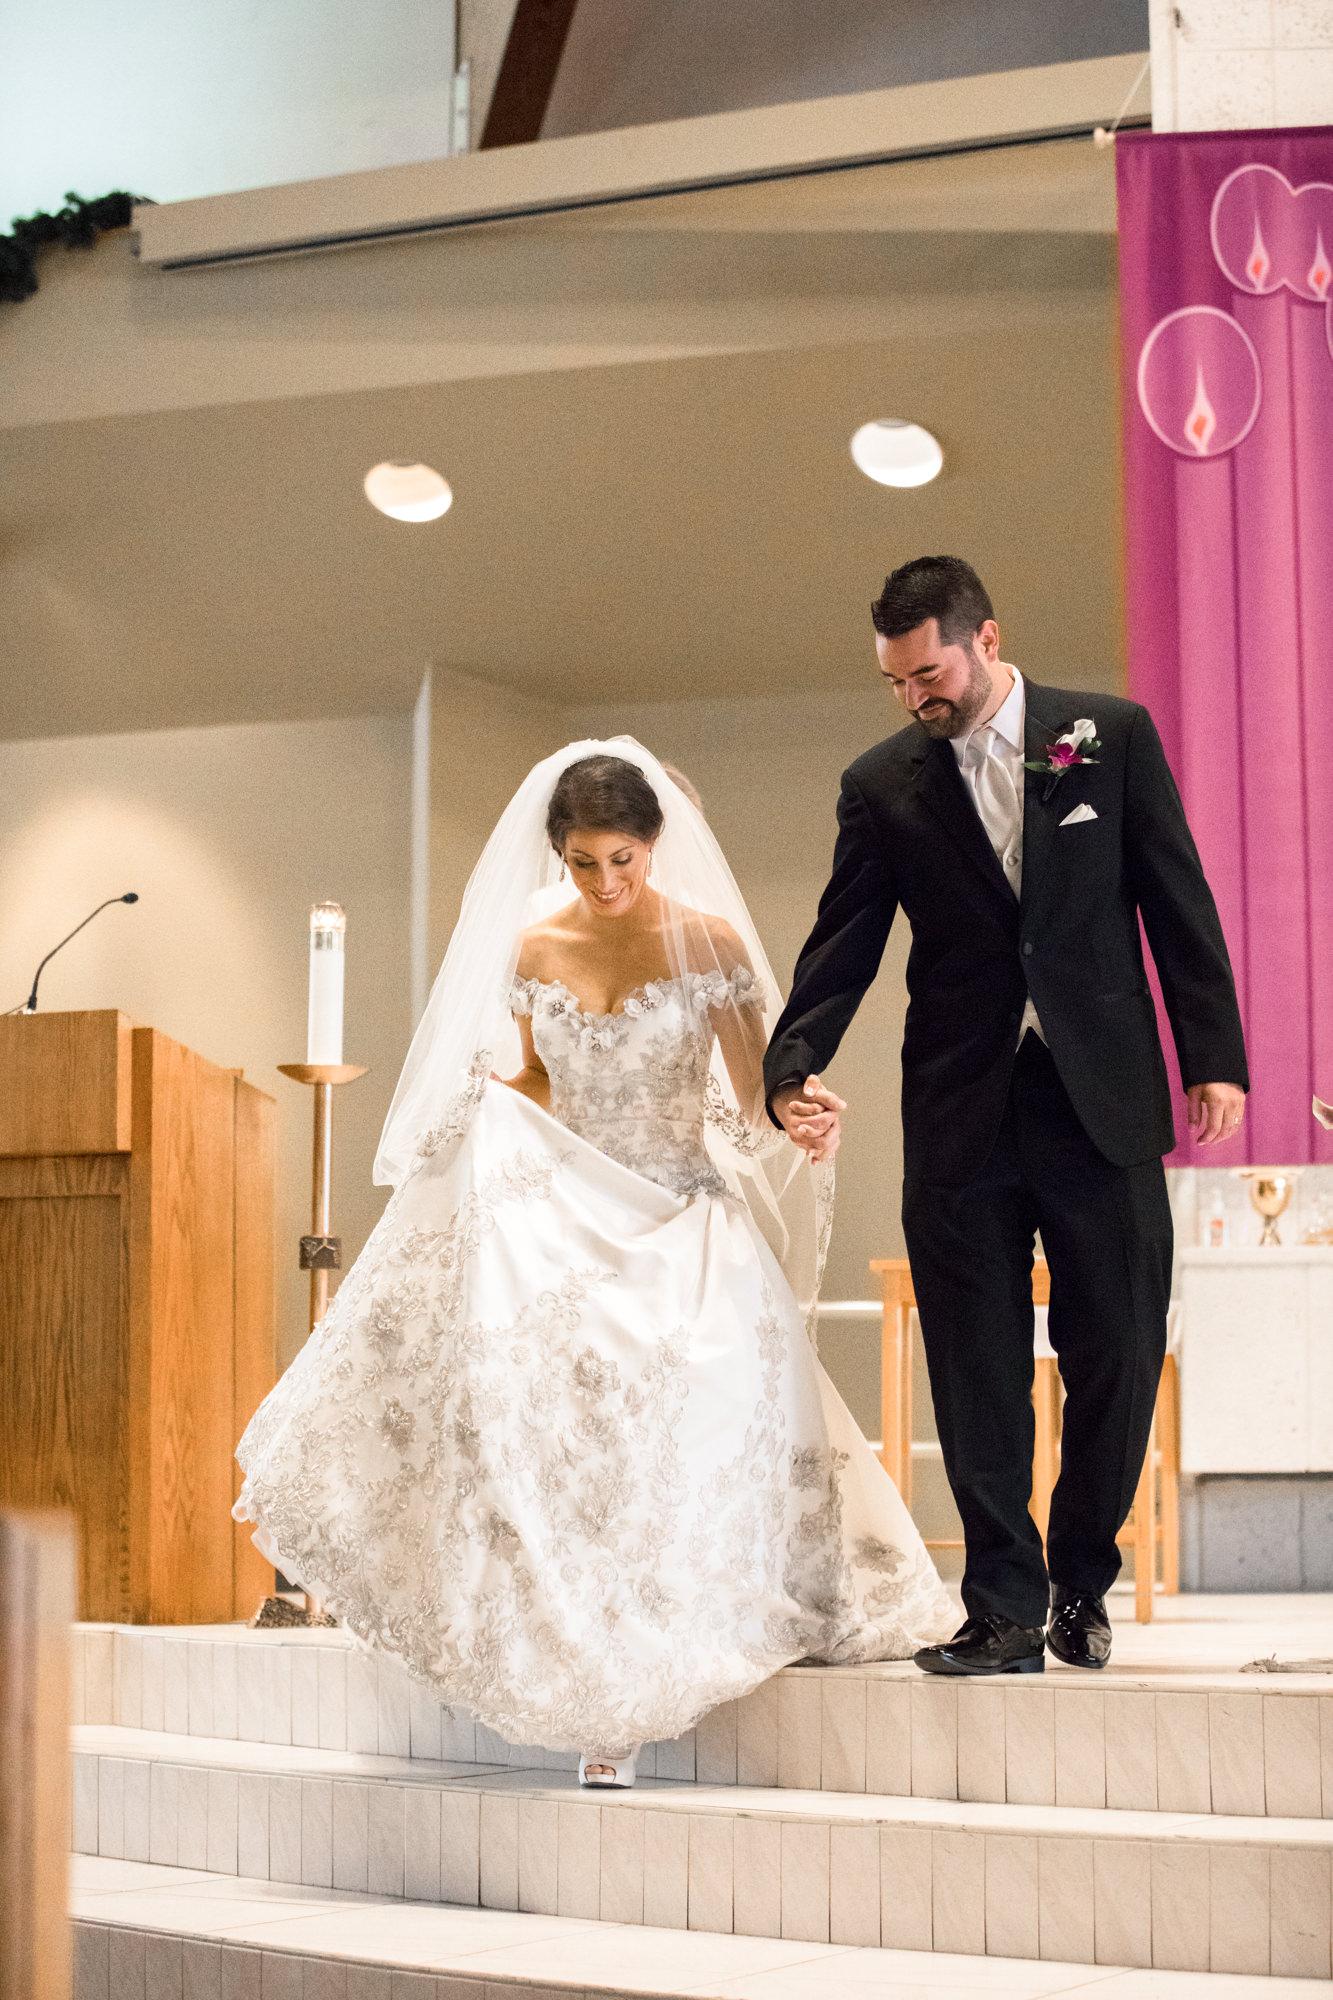 Benvenuto_Wedding_catholic_Florida_Bride-Groom-47.jpg